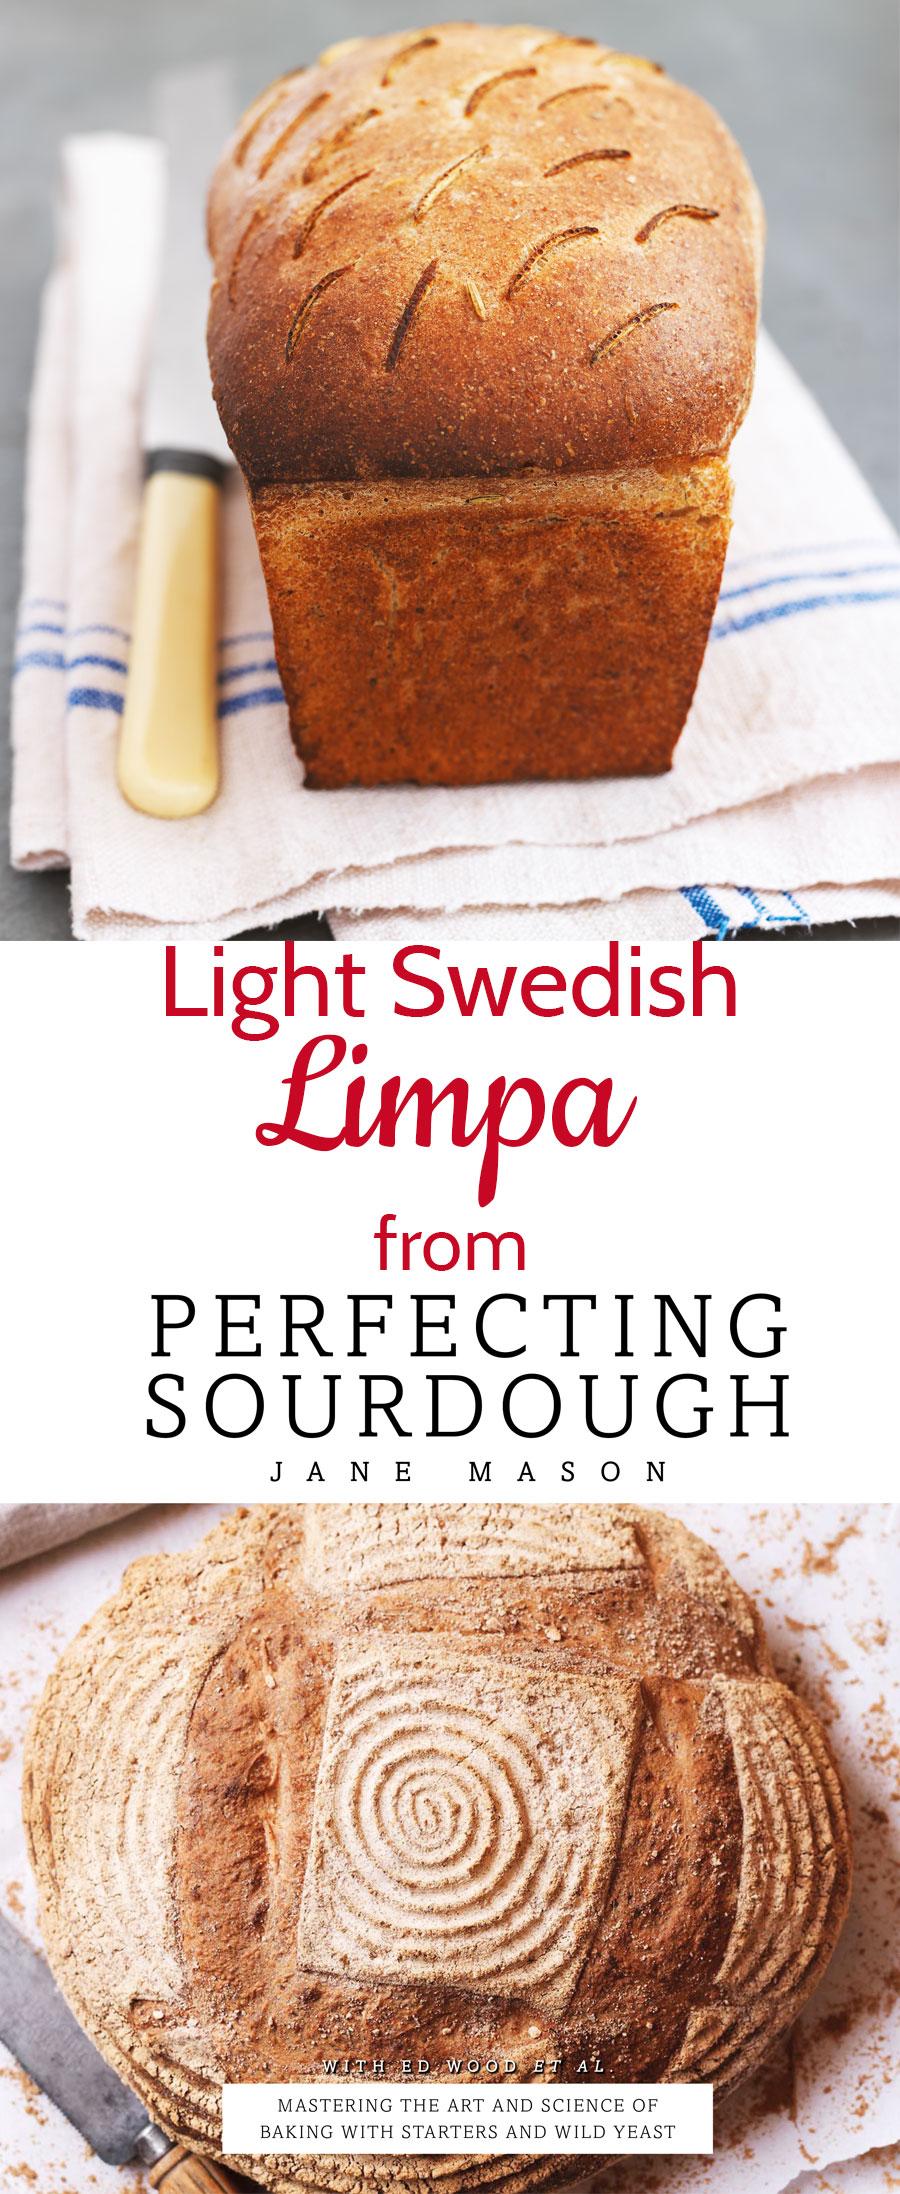 Light Swedish rye Limpa sourdough bread is a delicious alternative to wheat flour bread. Recipe from Perfecting Sourdough by Jane Mason